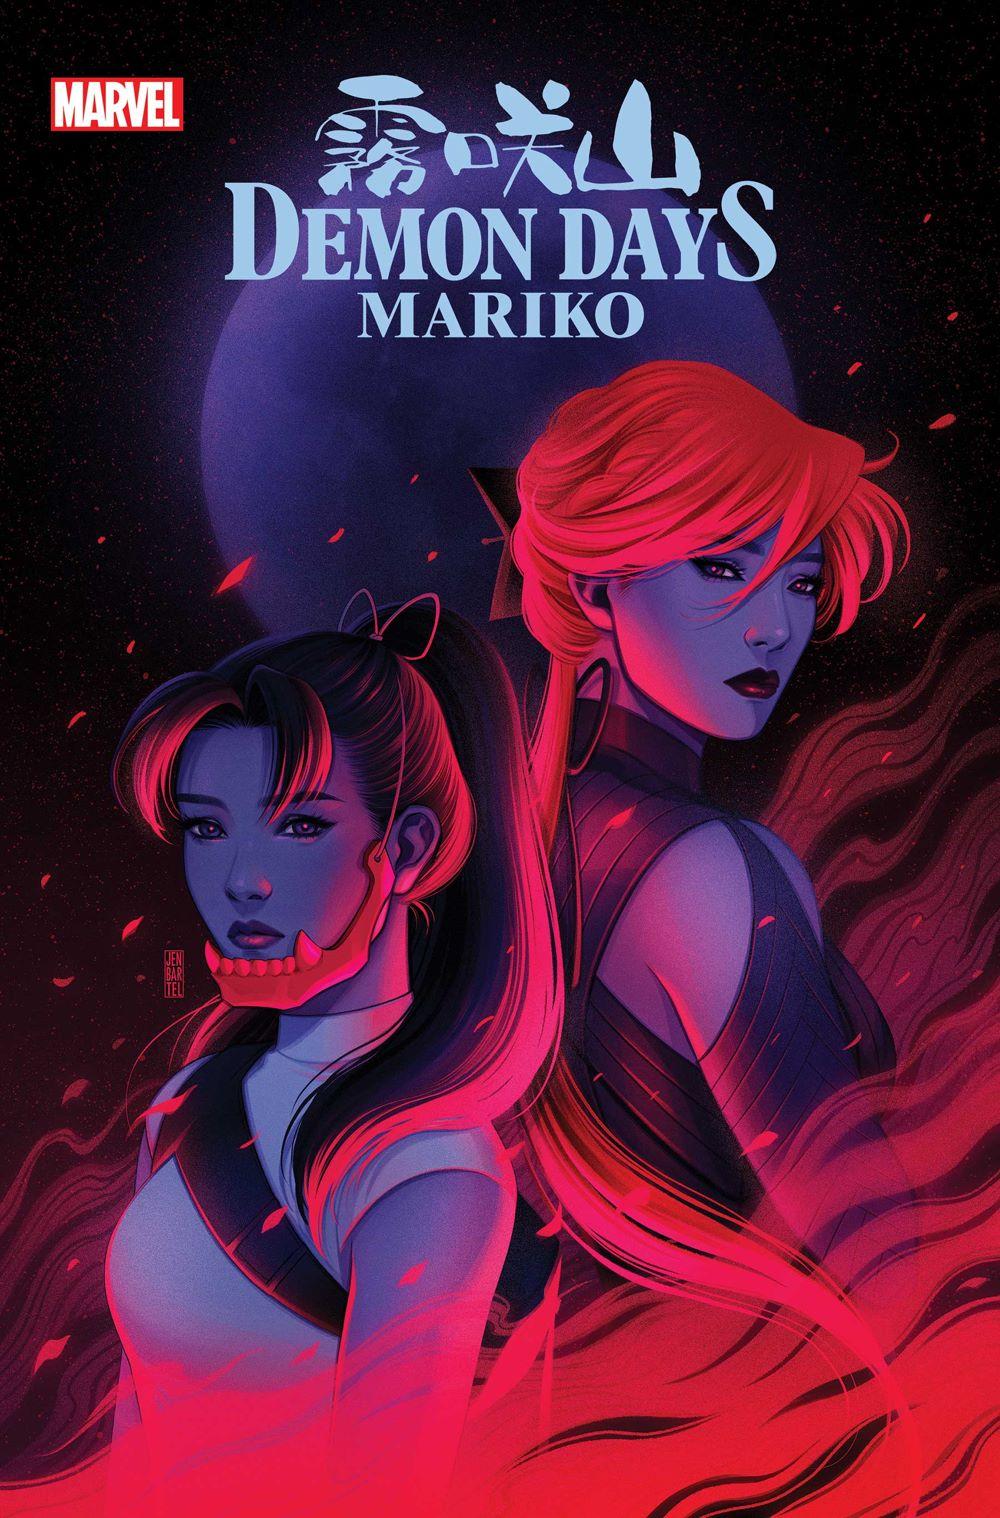 DEMONDAYSMARIKO2021001_Bartel_var Marvel Comics June 2021 Solicitations